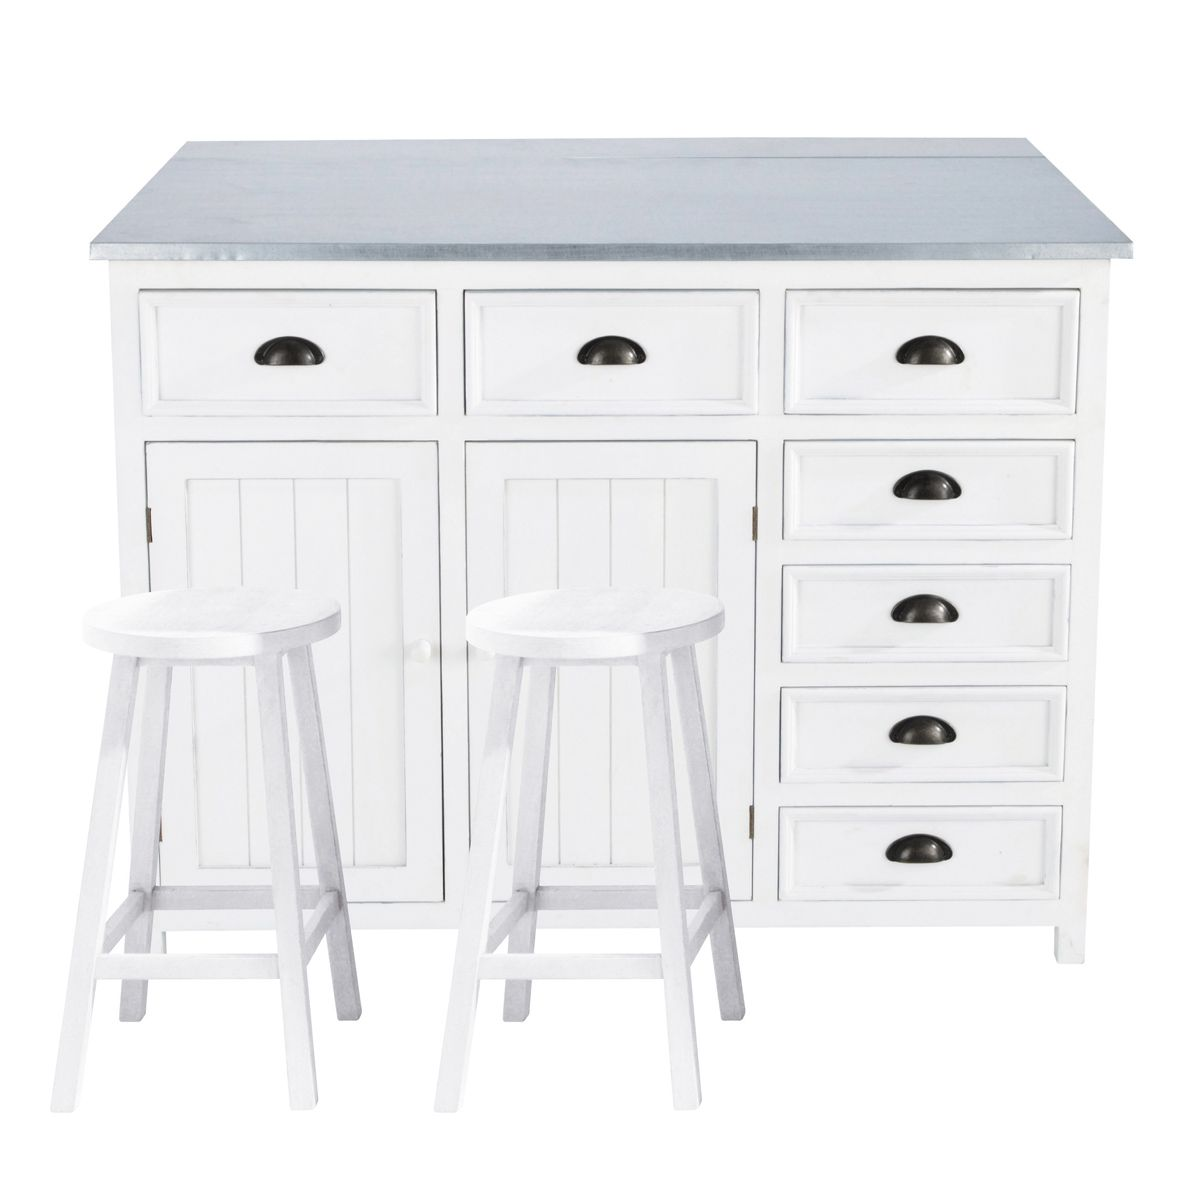 Kücheninsel aus Holz, B 120 cm, weiß Newport | Küche | Pinterest ...